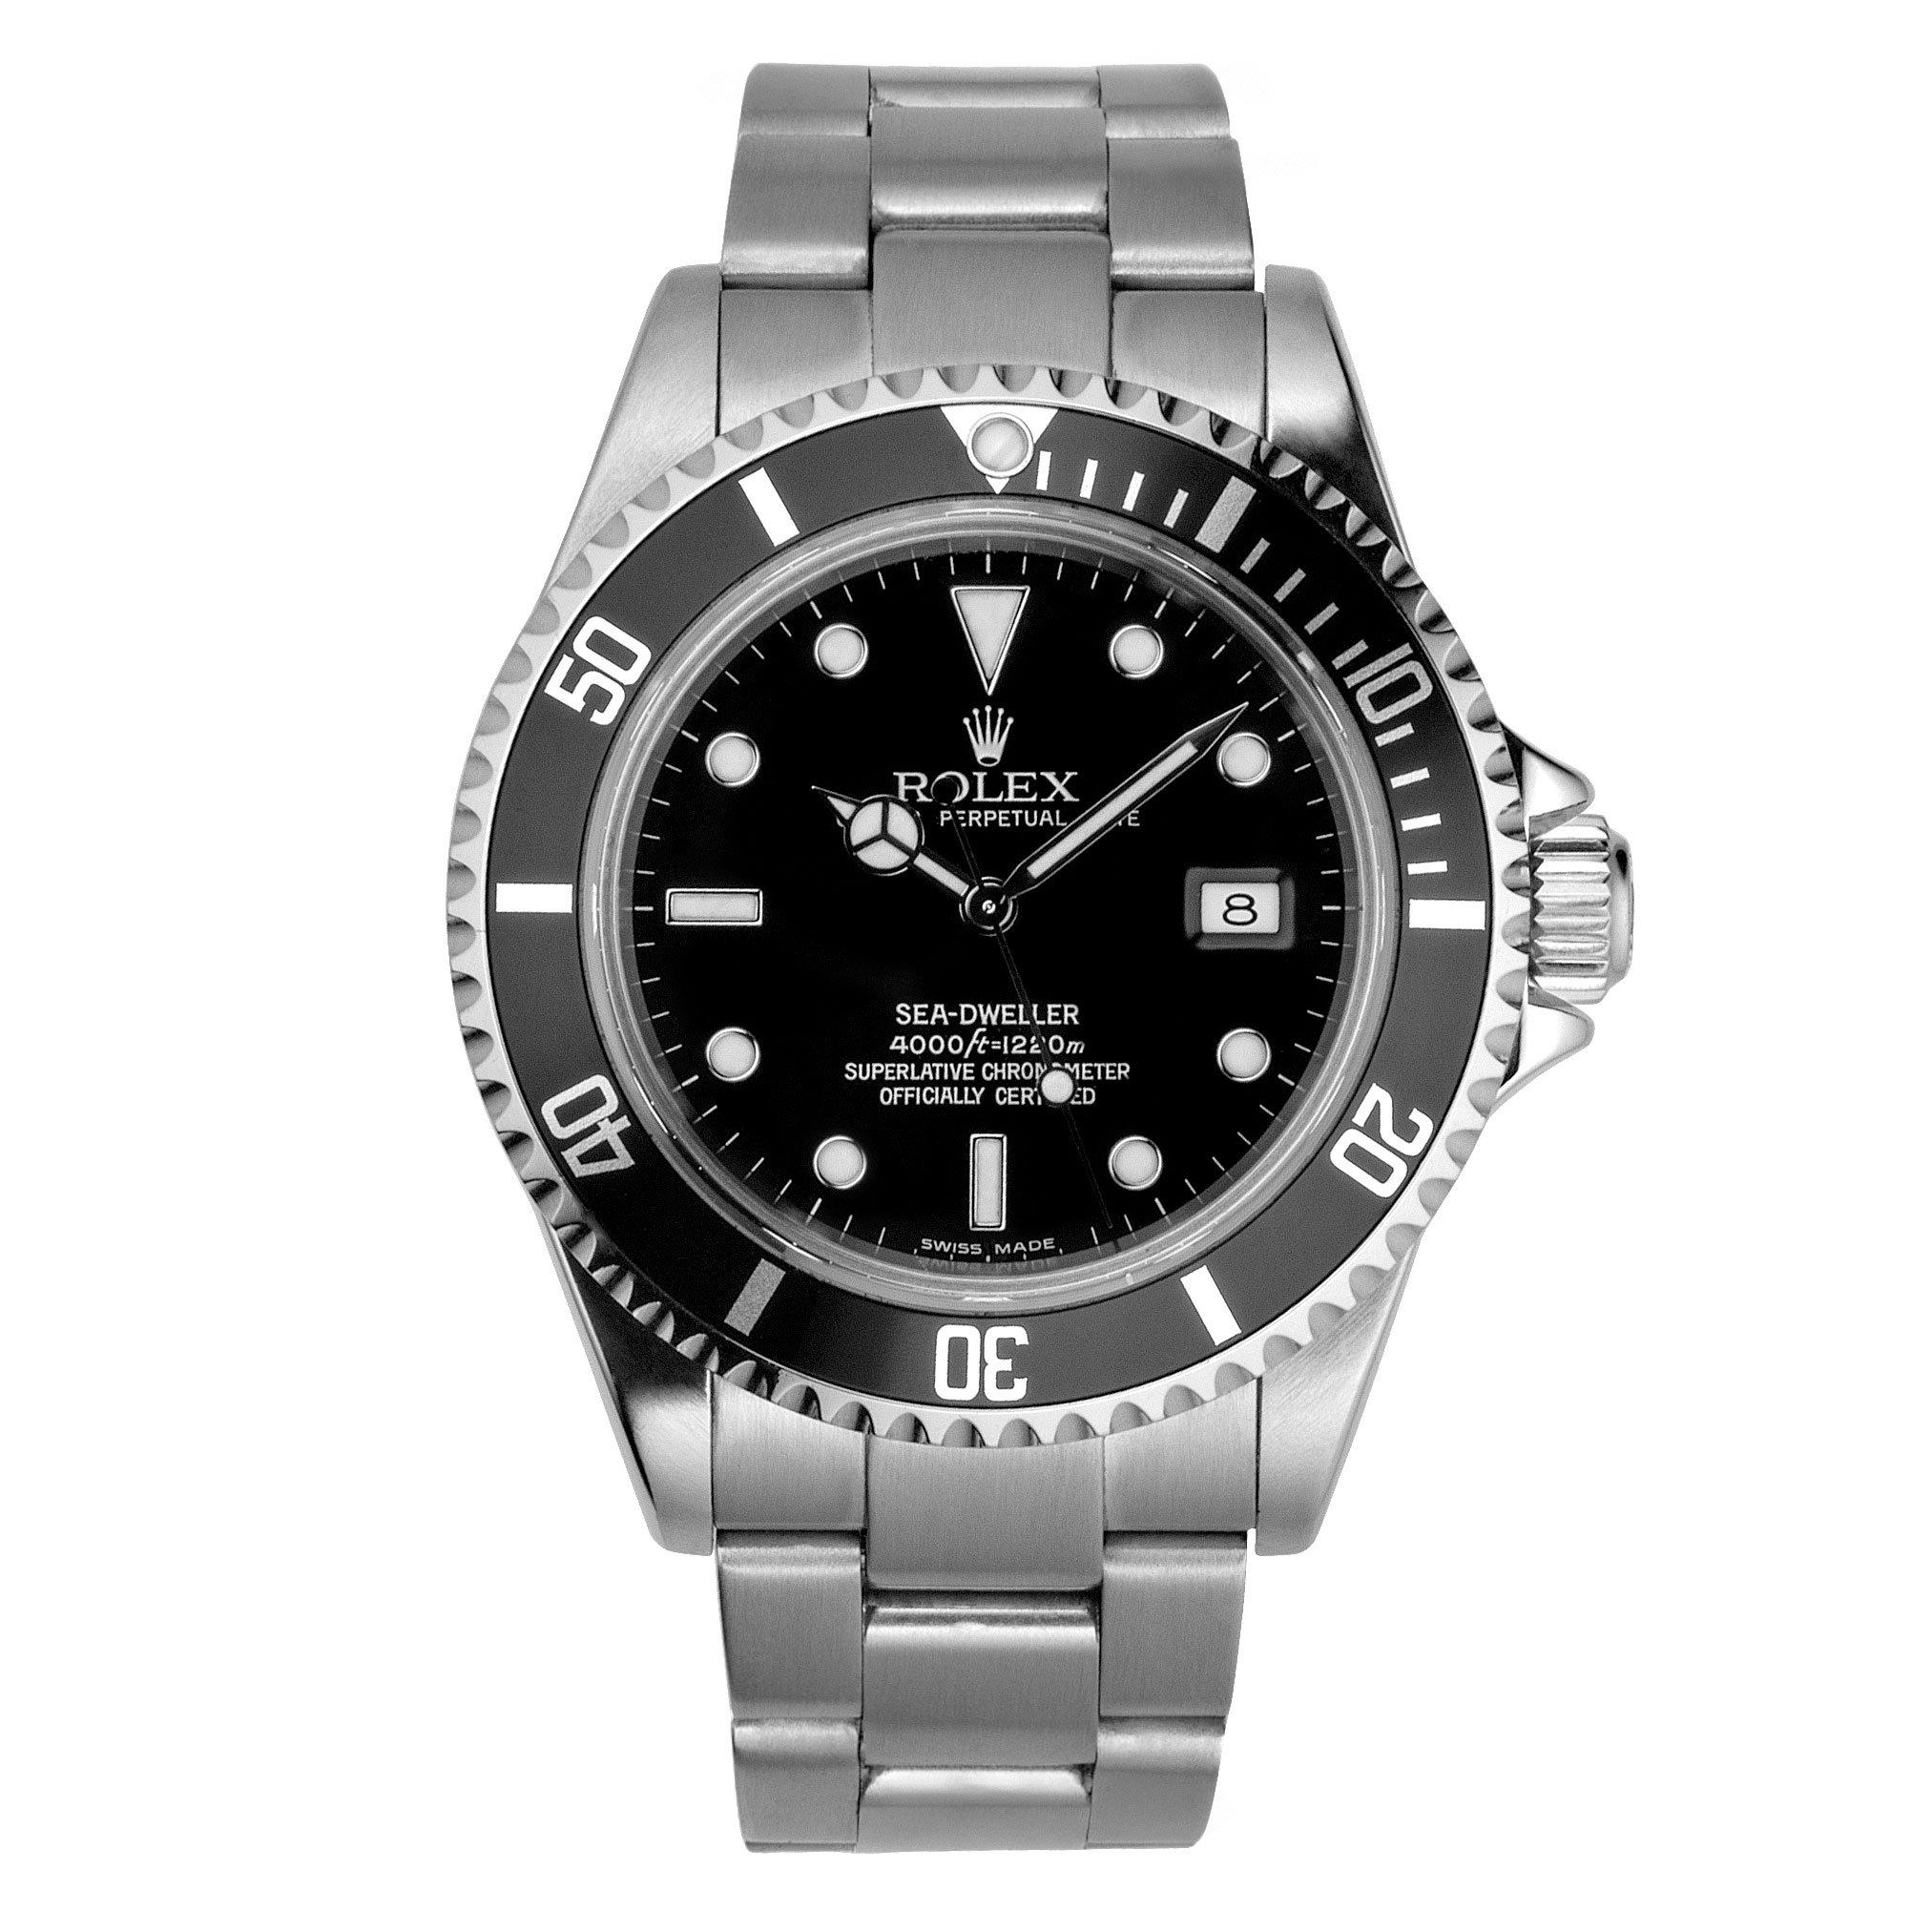 Rolex Pre-Owned Sea Dweller Automatic Men's Watch